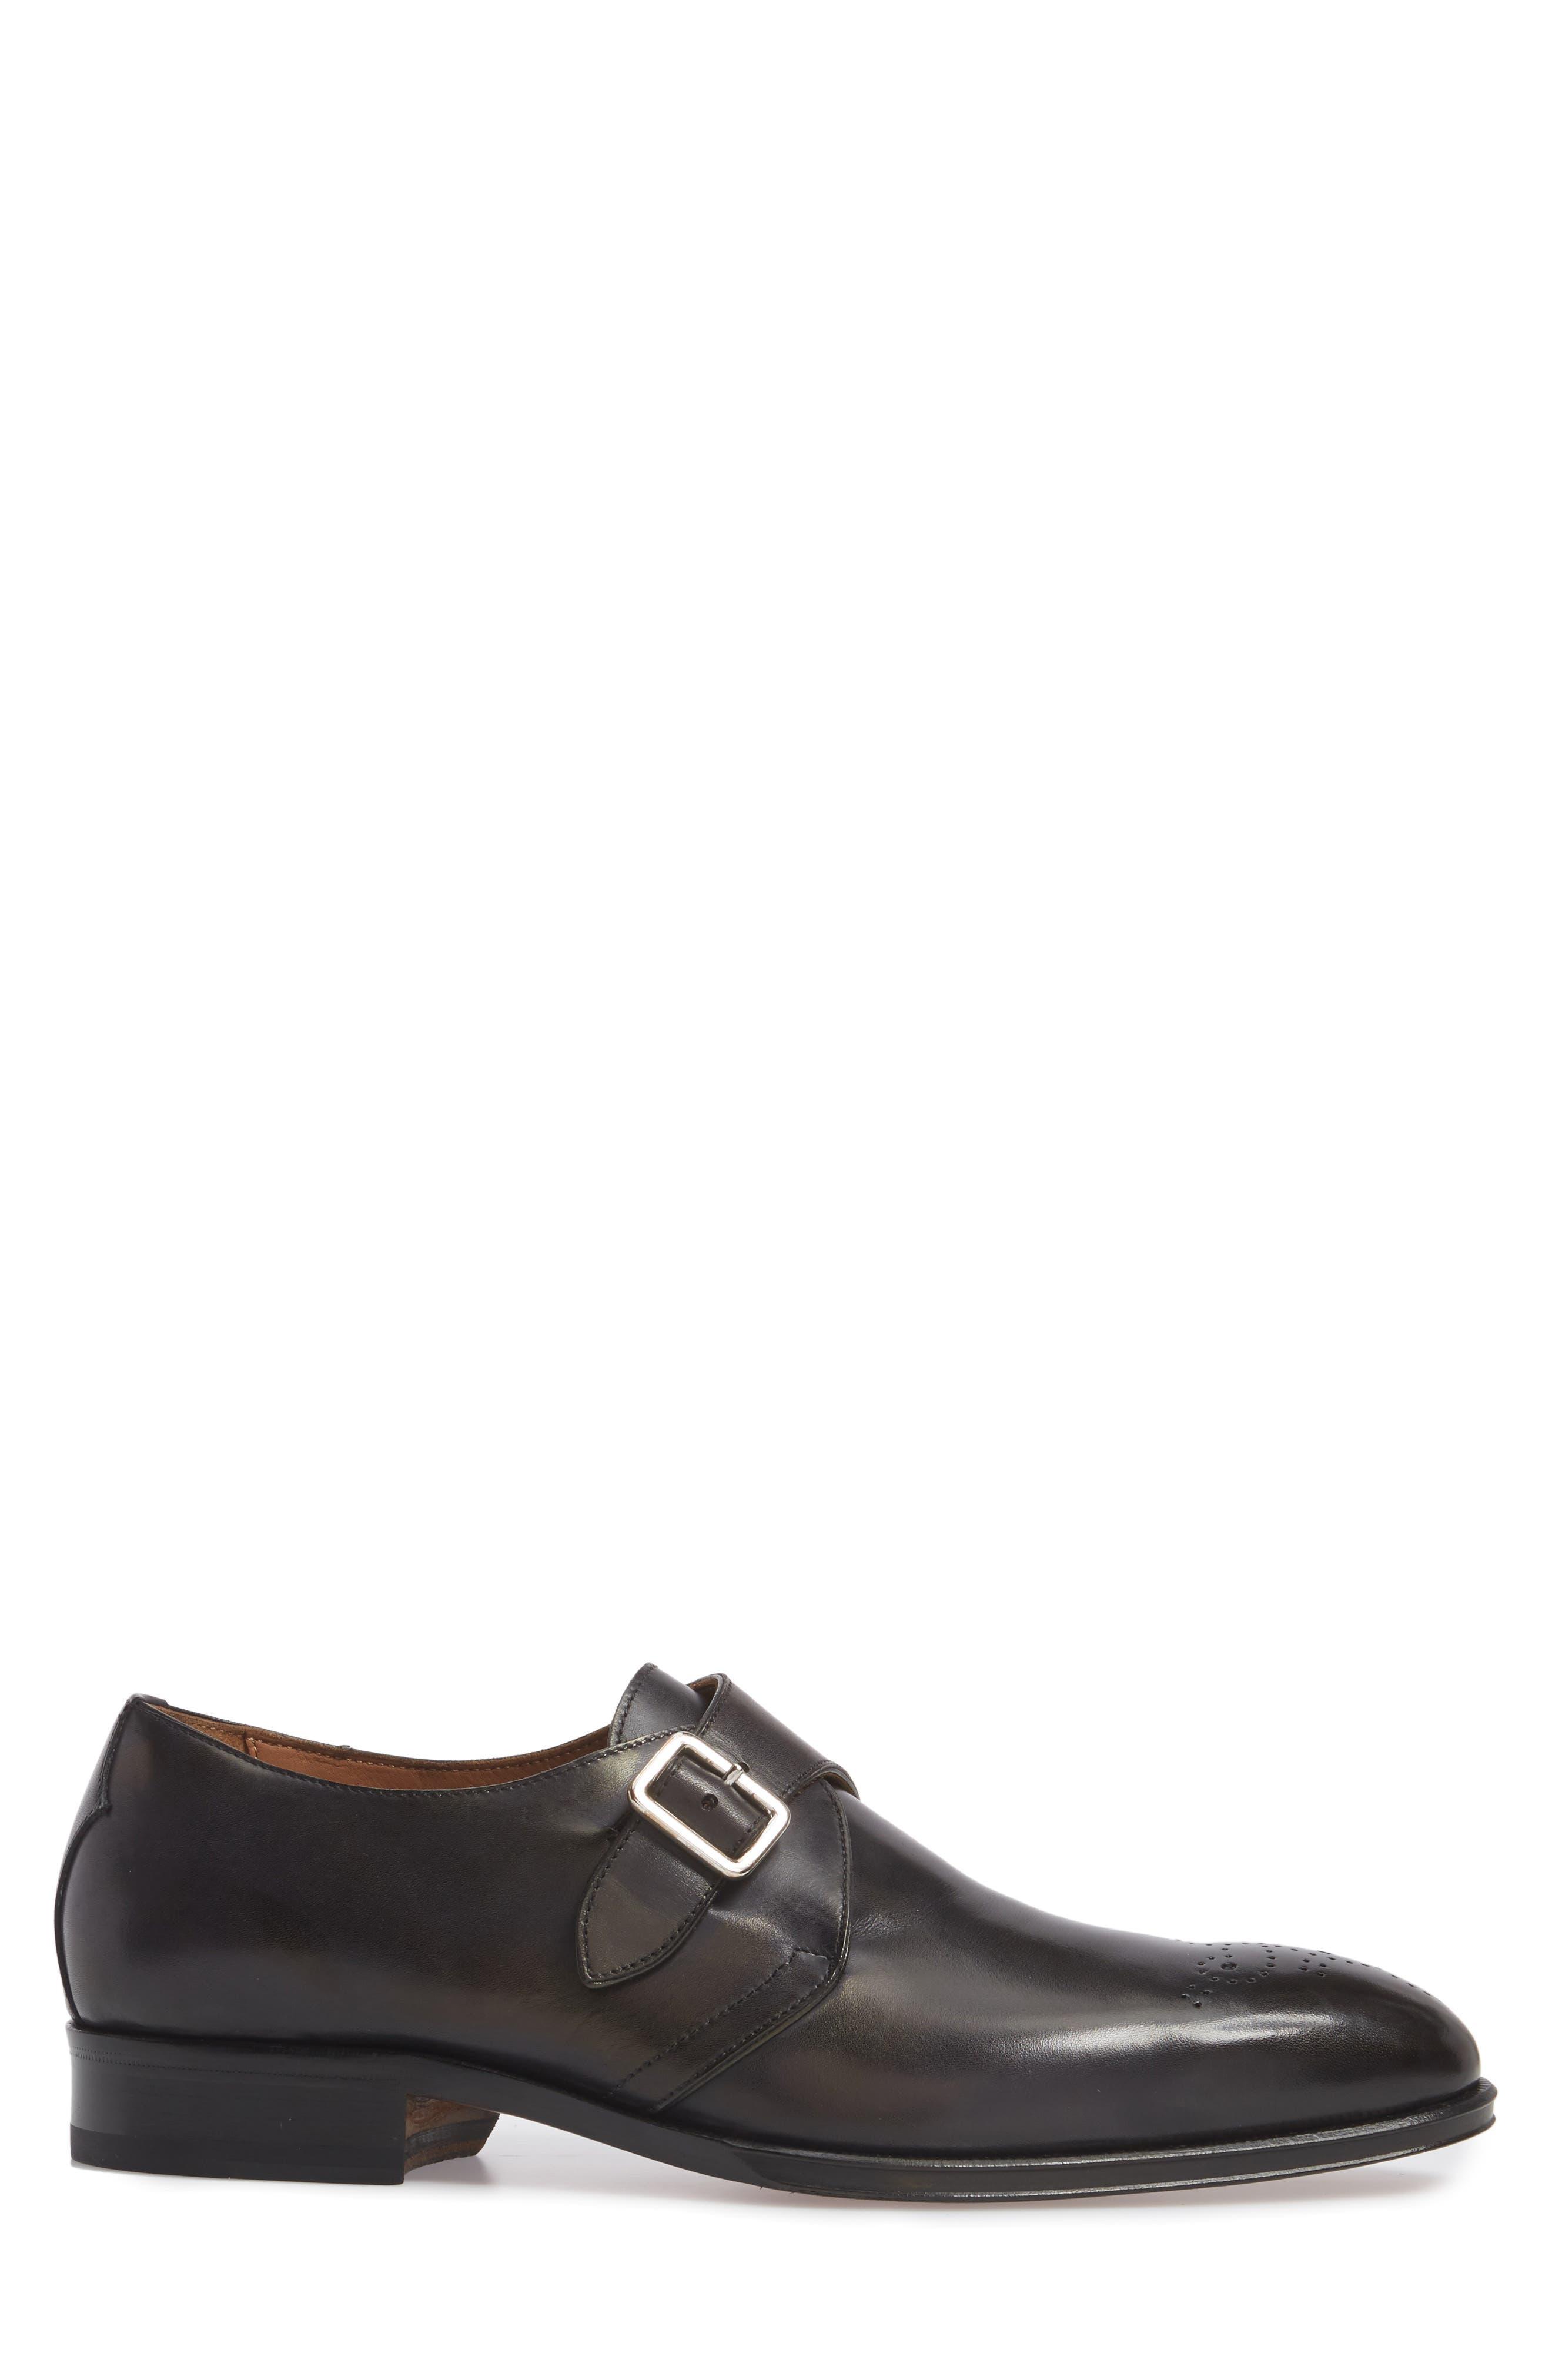 Gallo Bianco Bologna Monk Strap Shoe,                             Alternate thumbnail 3, color,                             402